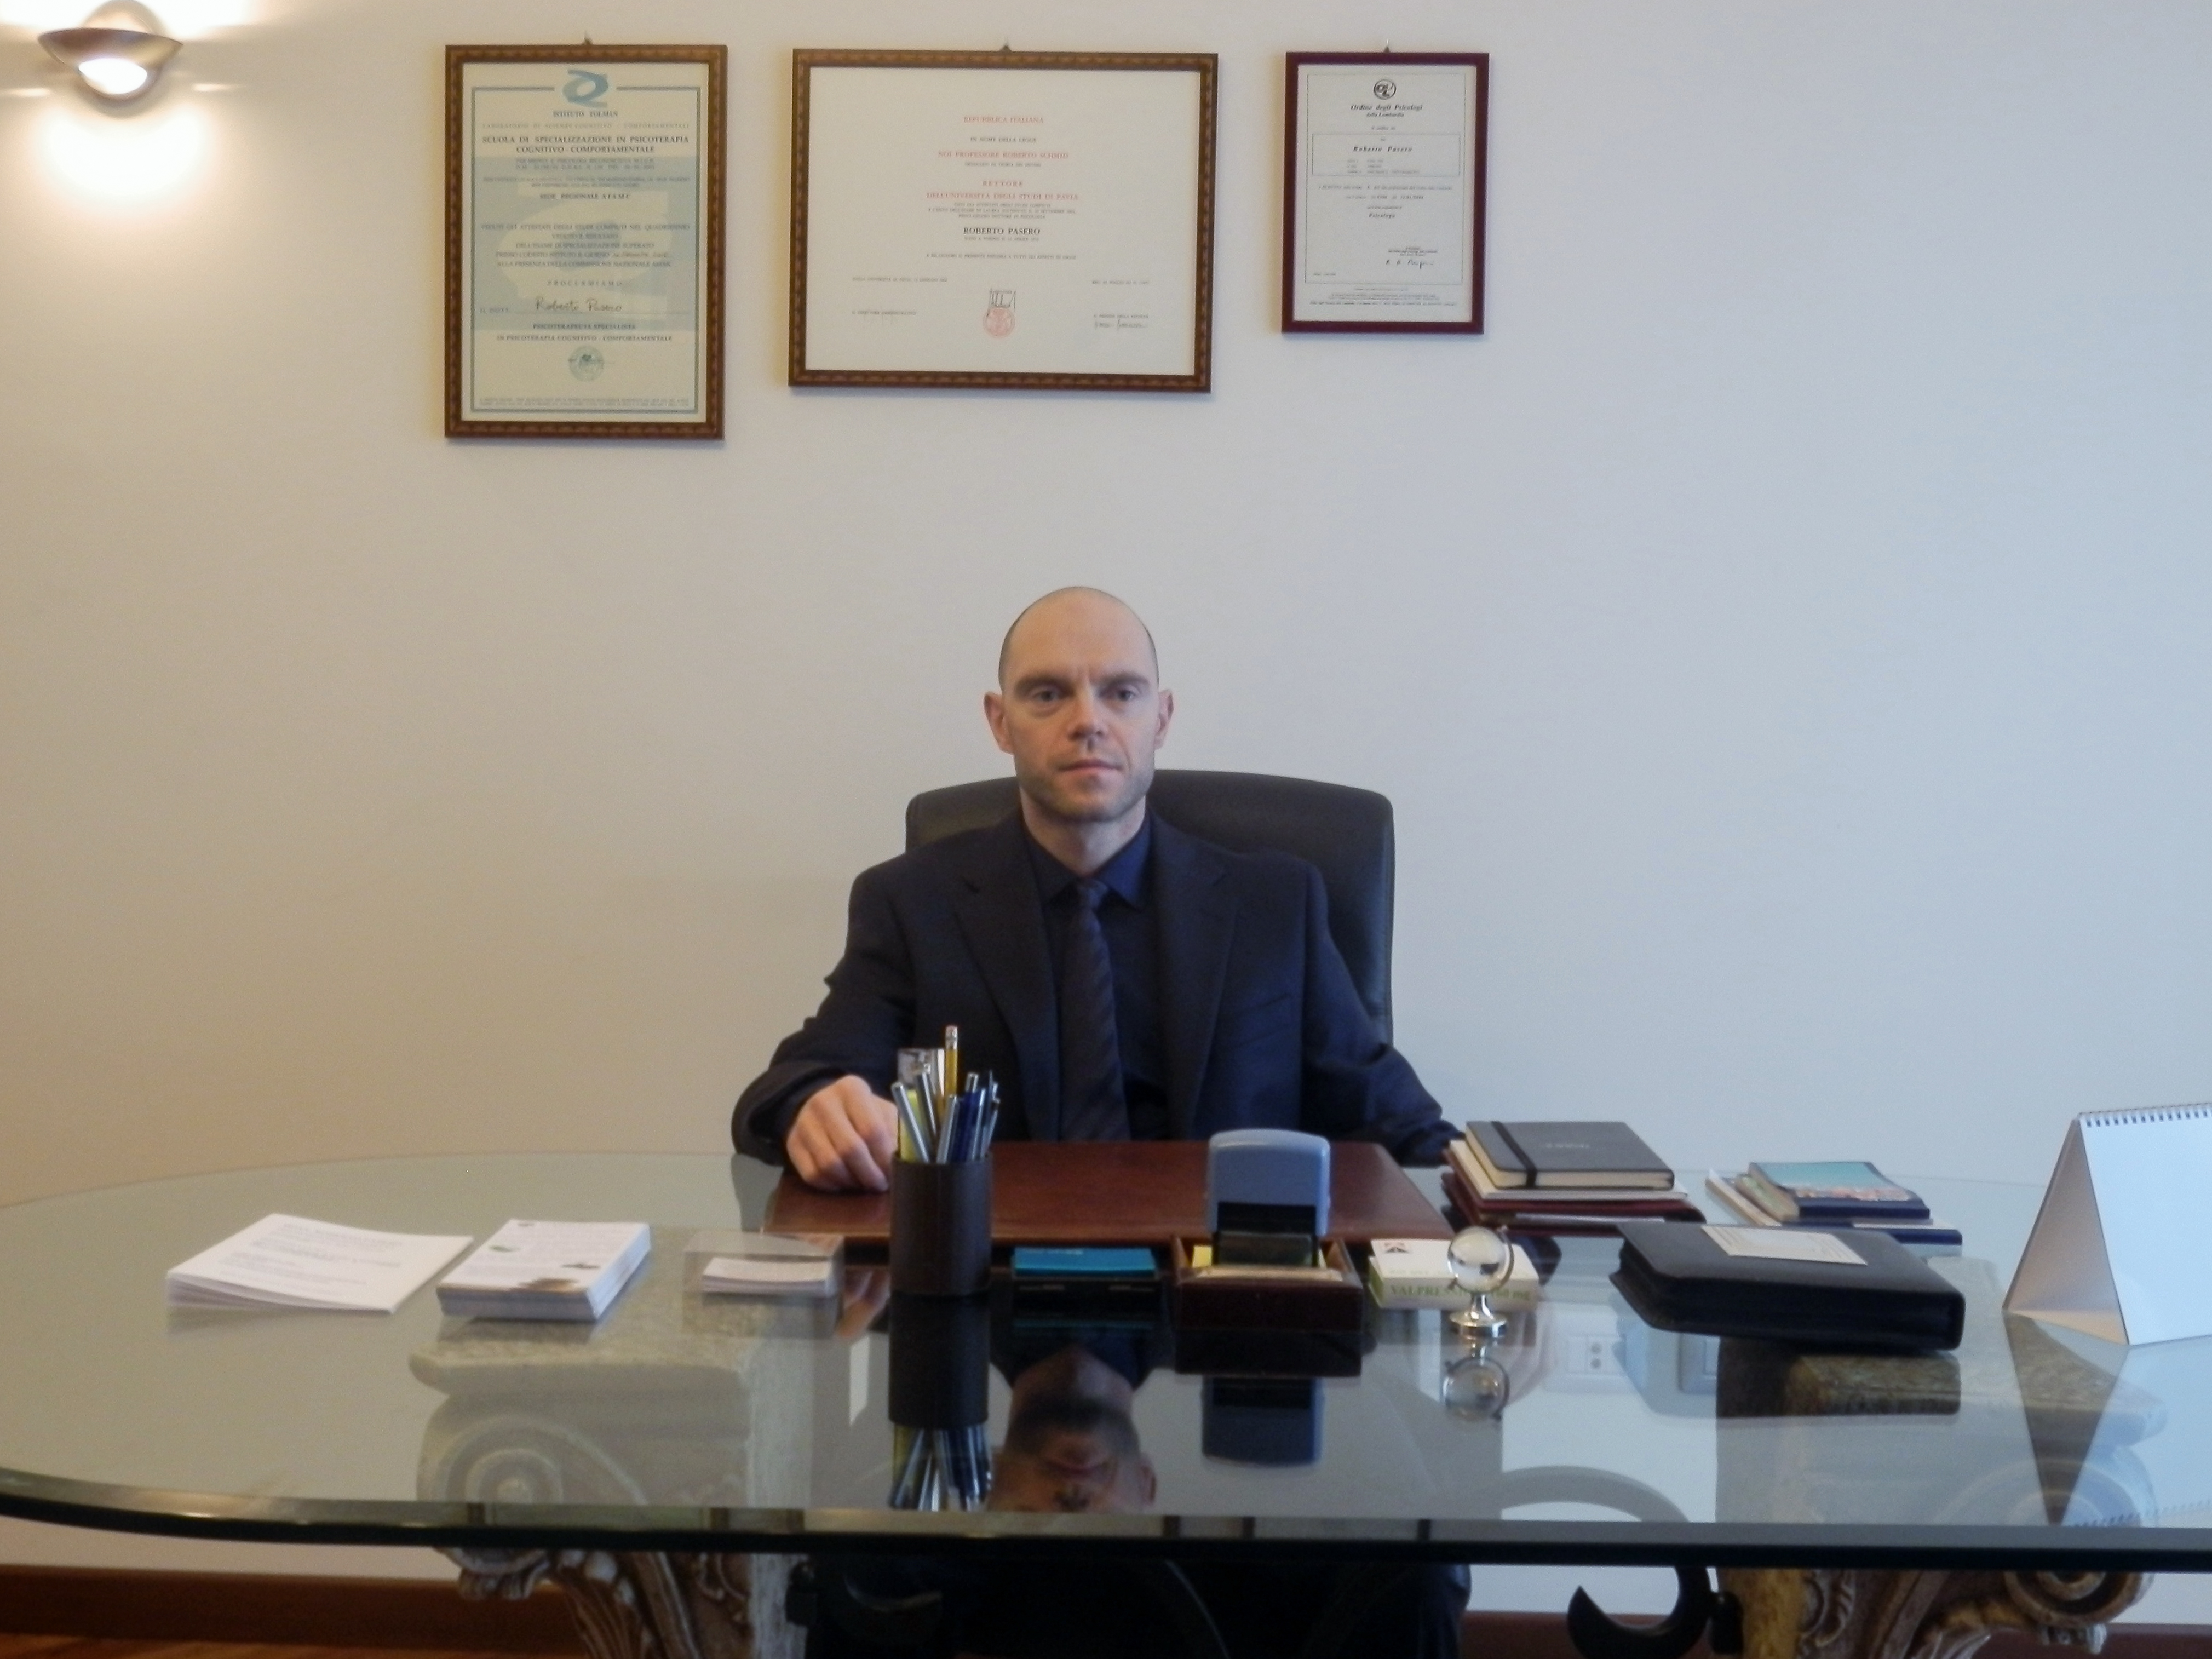 dott Roberto Pasero